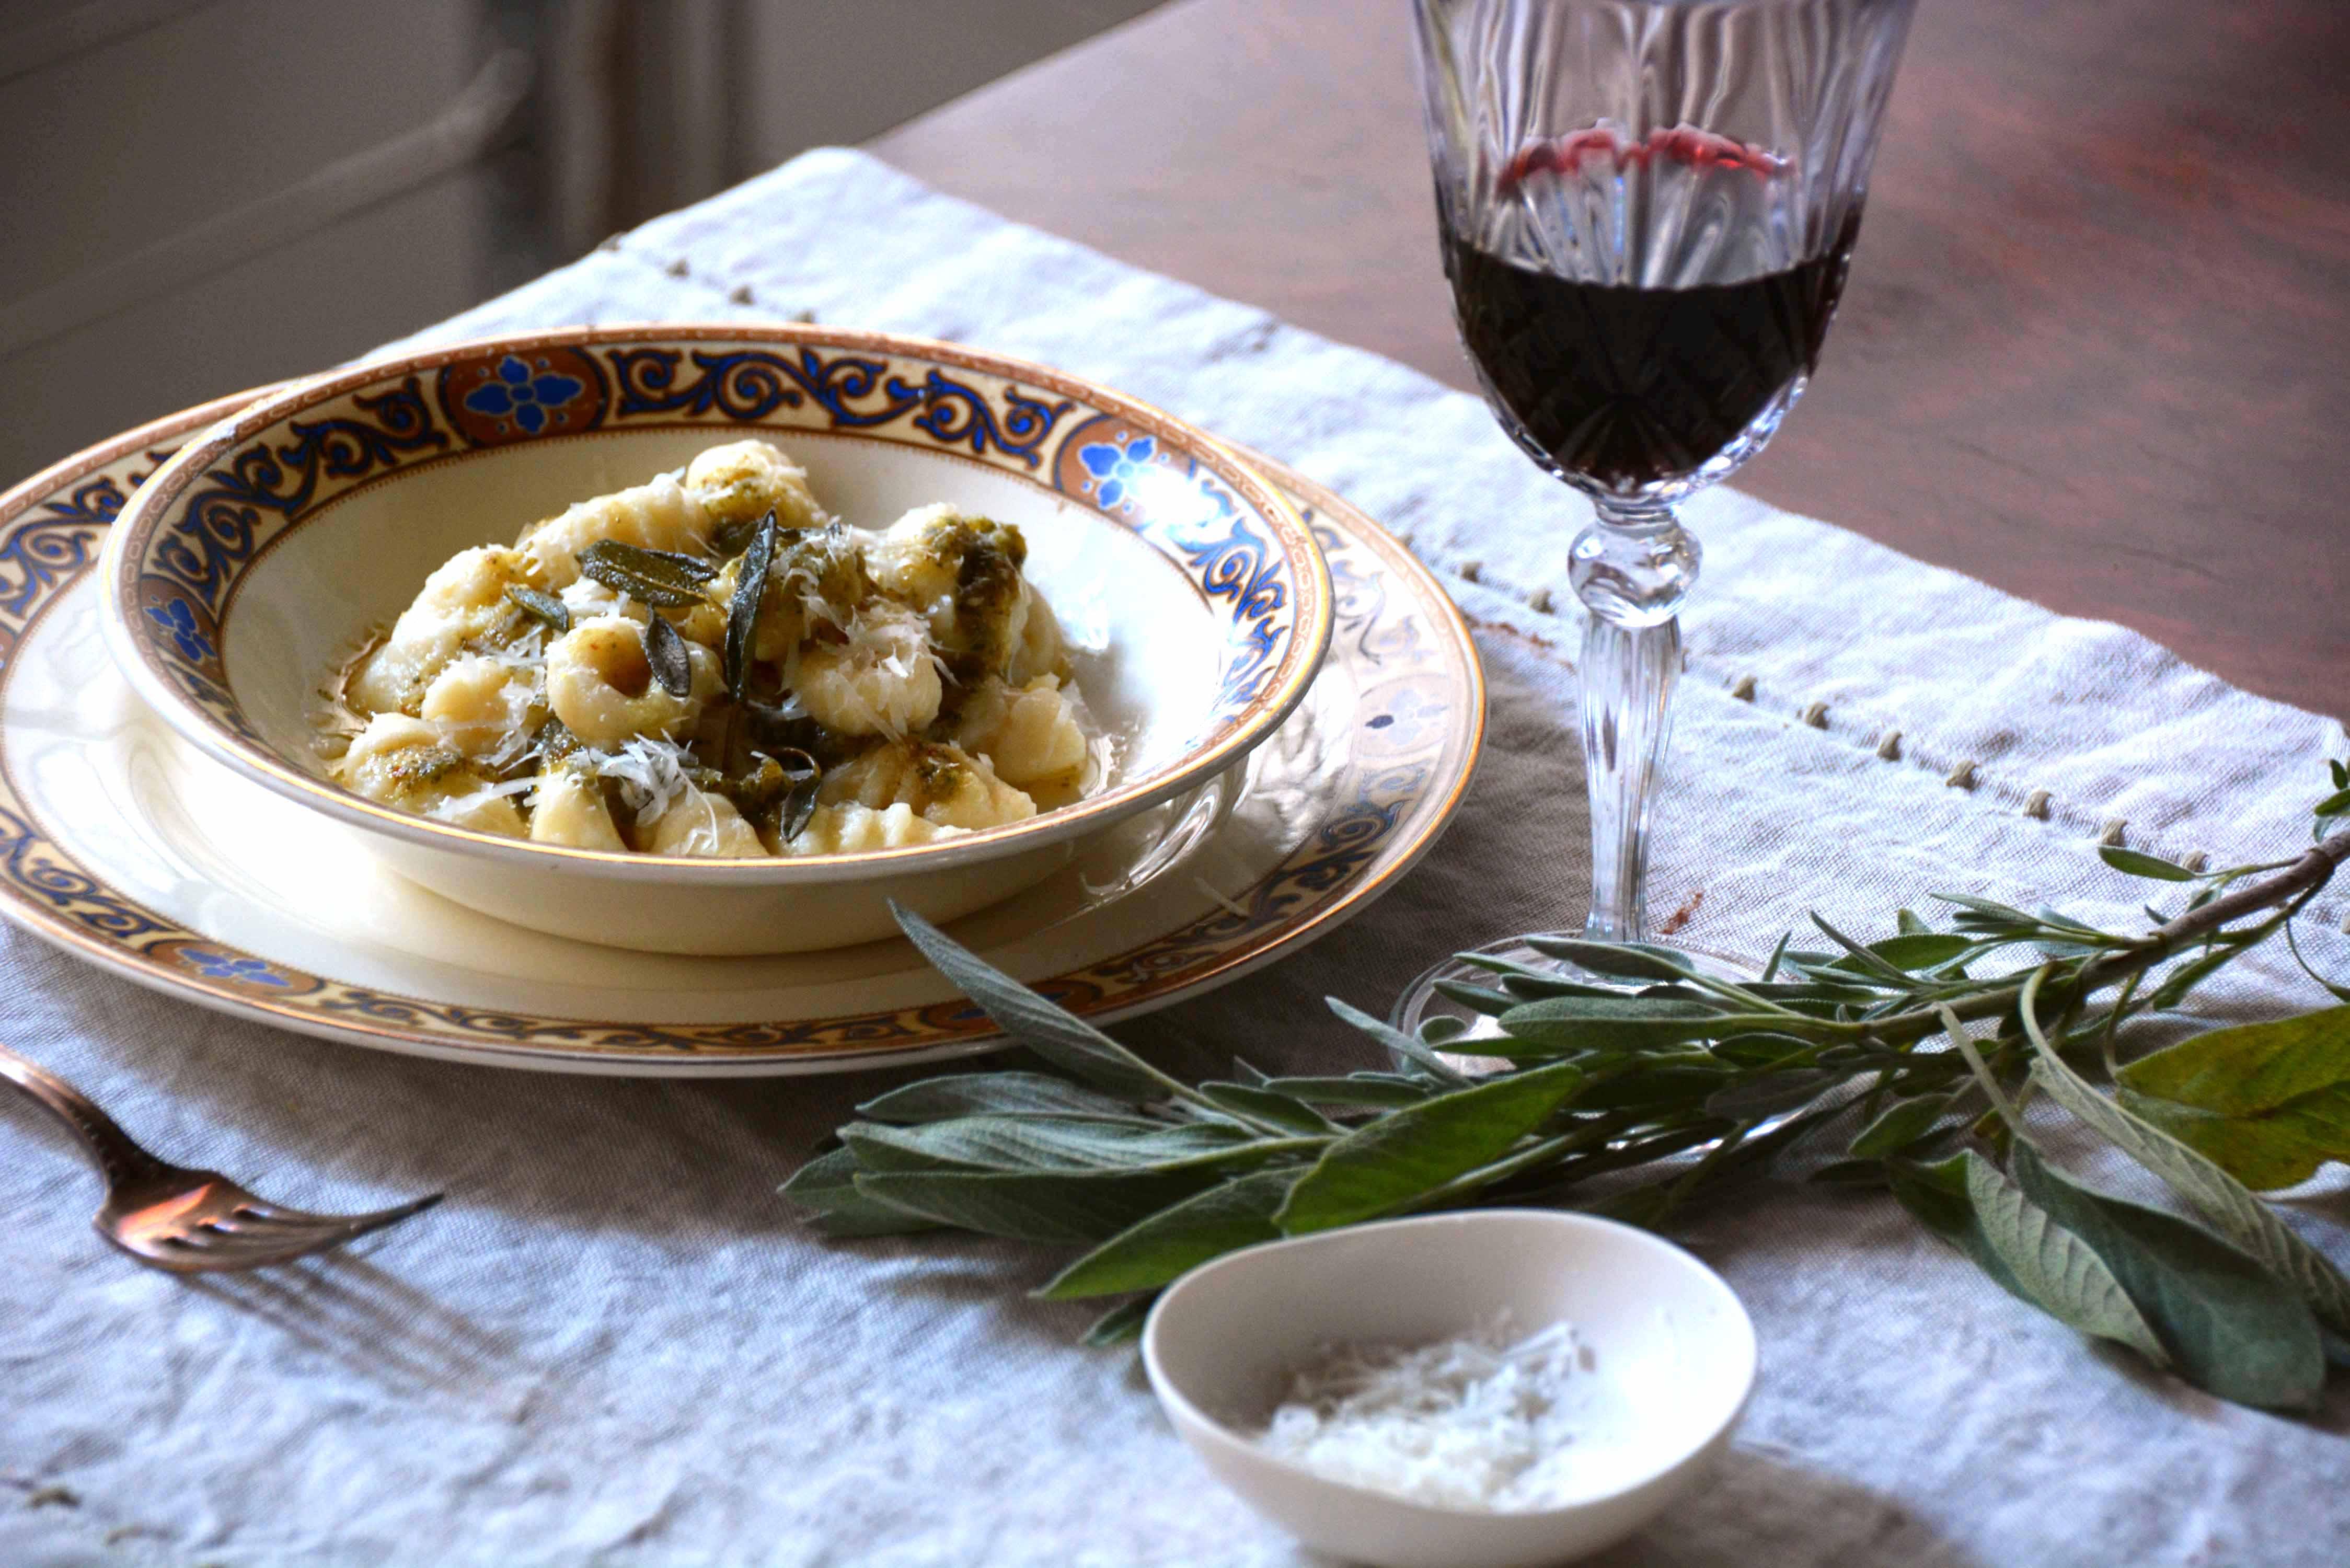 Pesto con salvia e noci (Sage and walnut pesto) – and a gnocchi cooking class